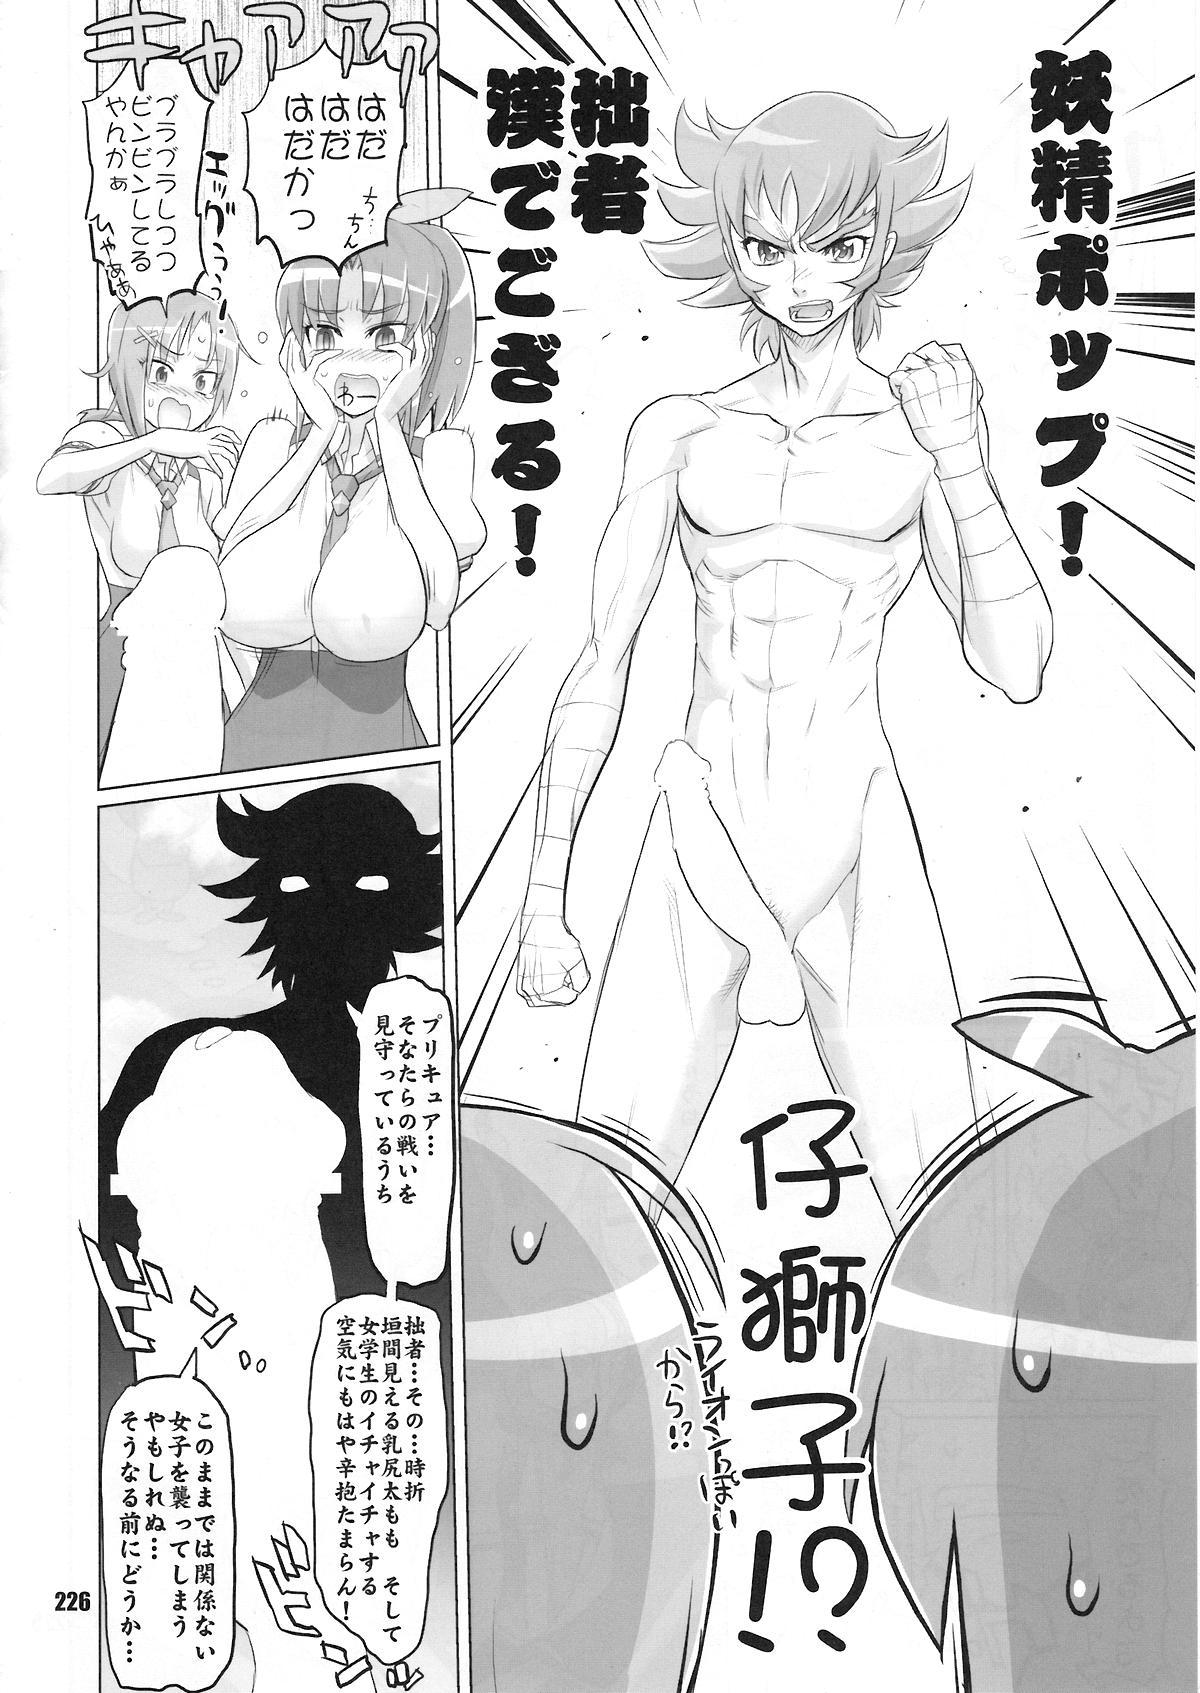 Inazuma Pretty Warrior 223